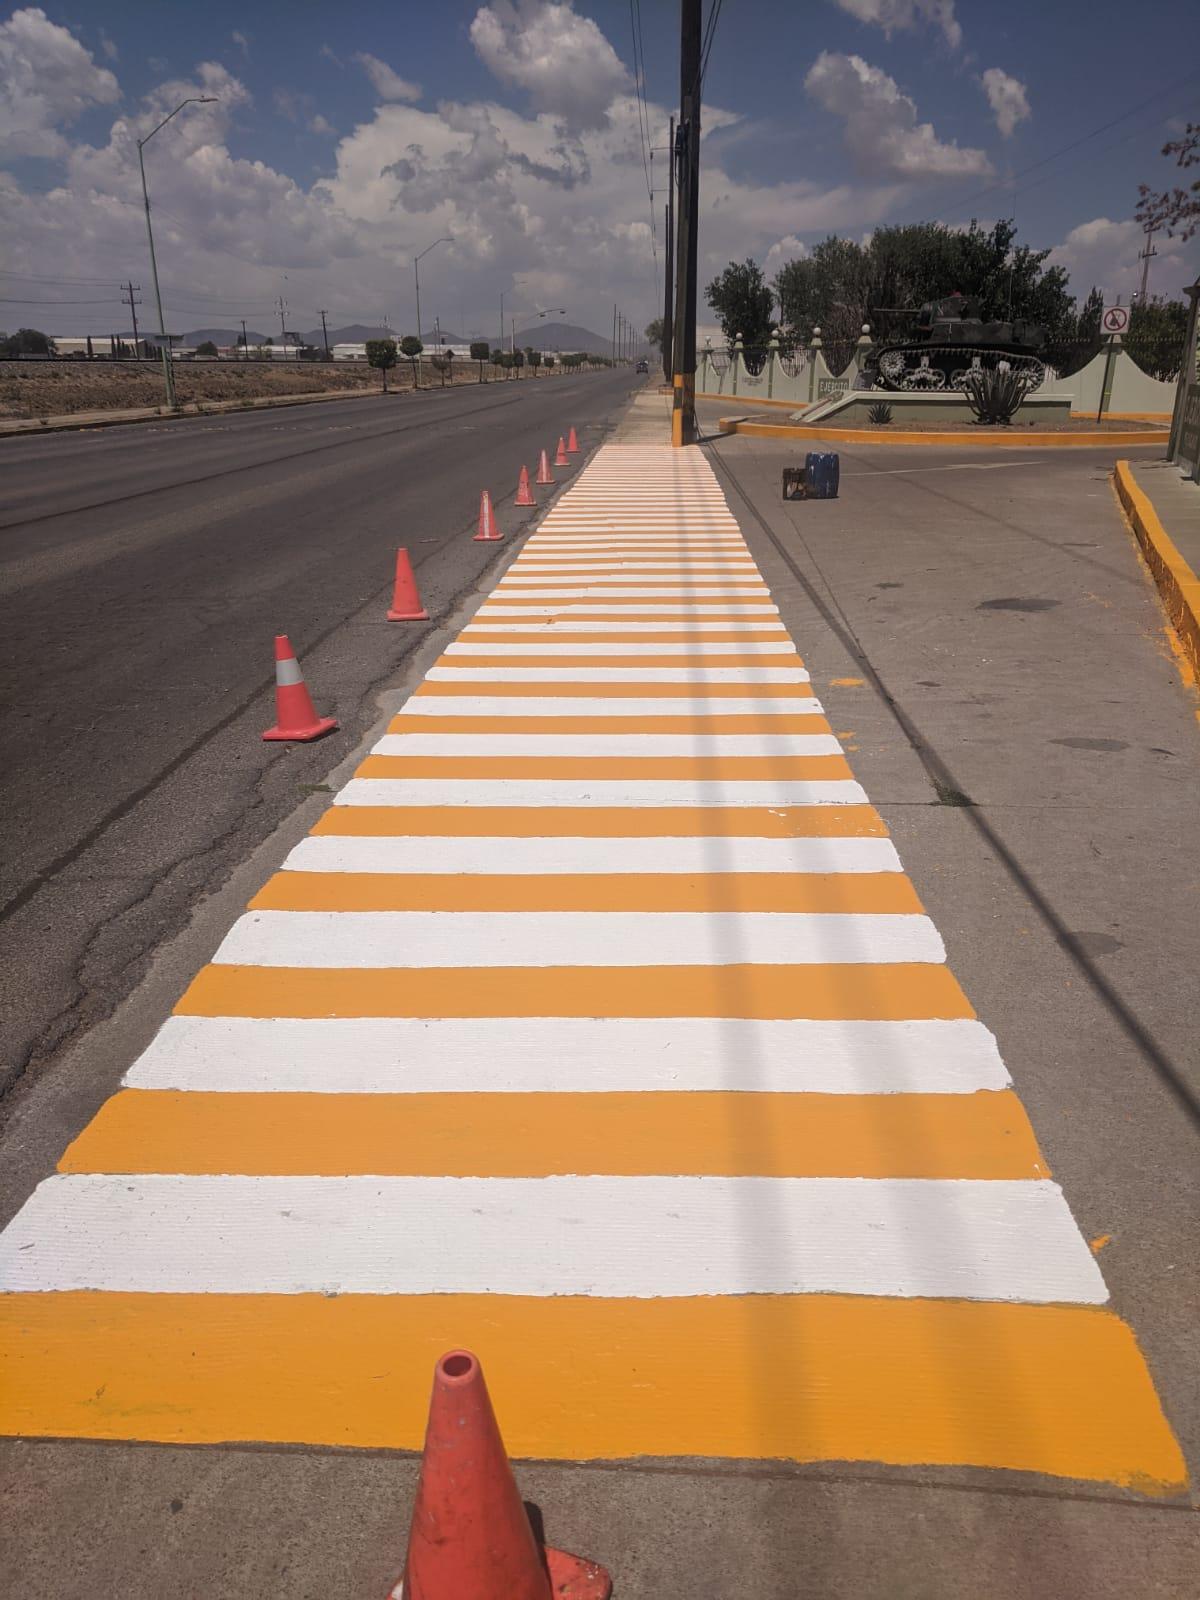 Continúa Policía Vial labores de señalización en Cuauhtémoc